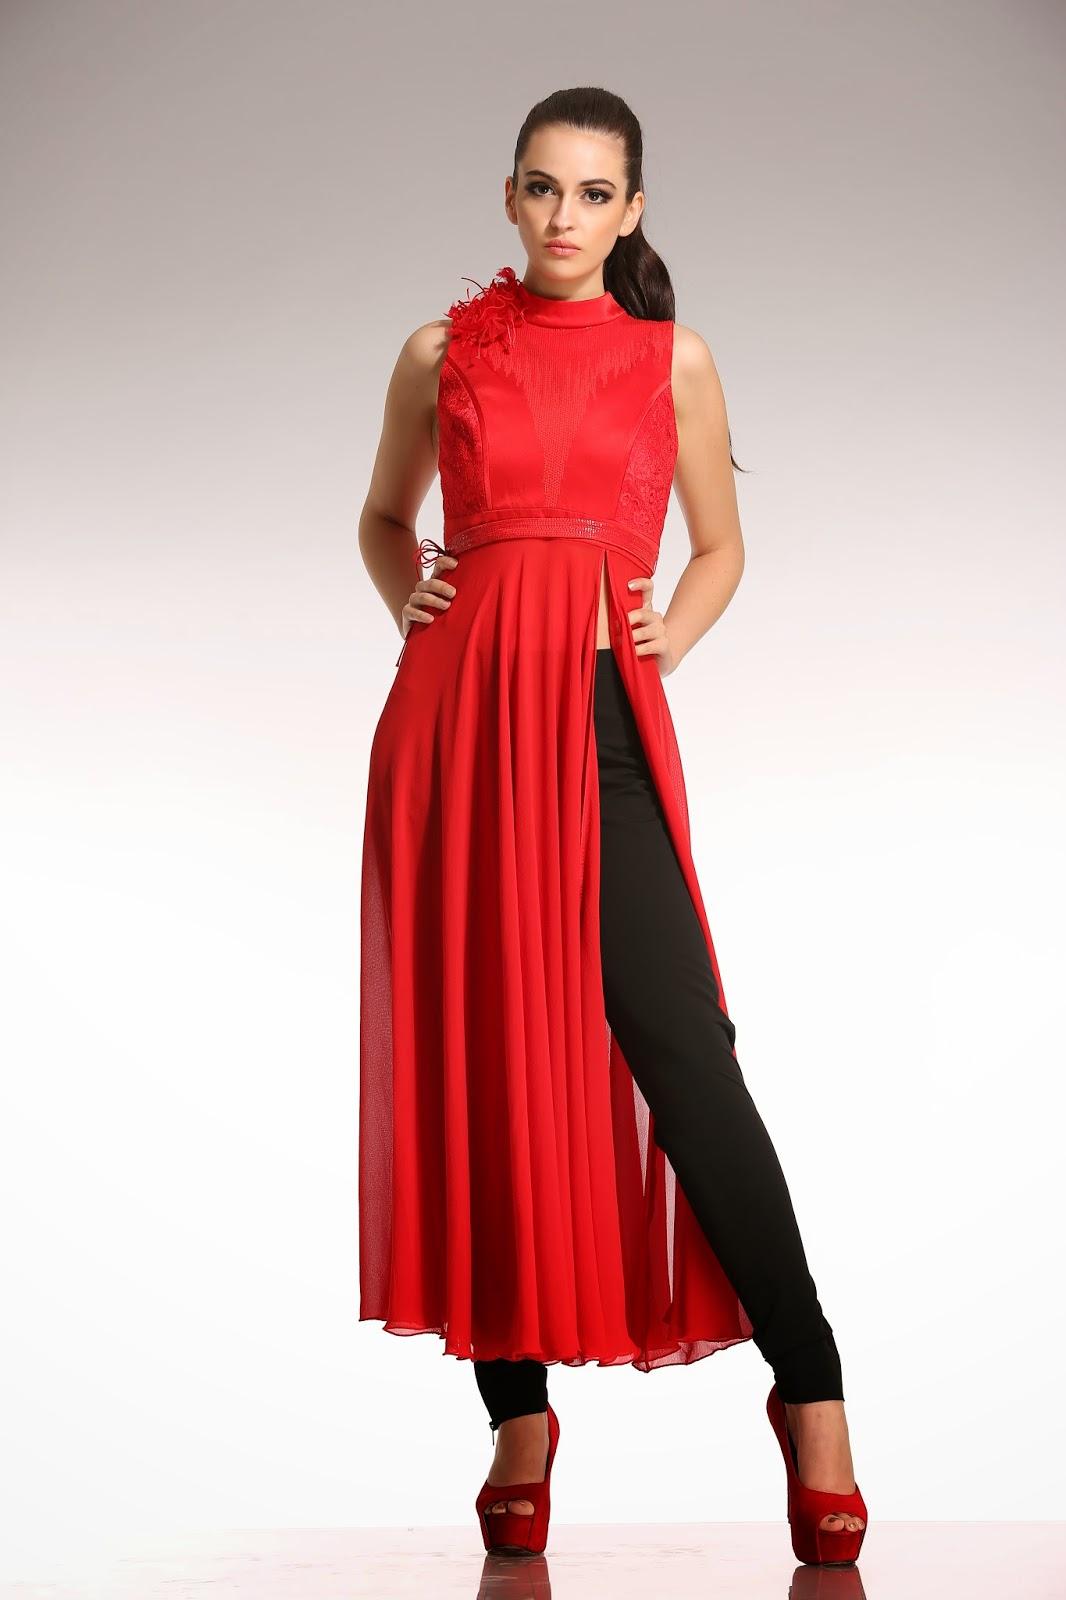 Unique Top Womens Dress Designers With Wonderful Photo In Canada U2013 Playzoa.com